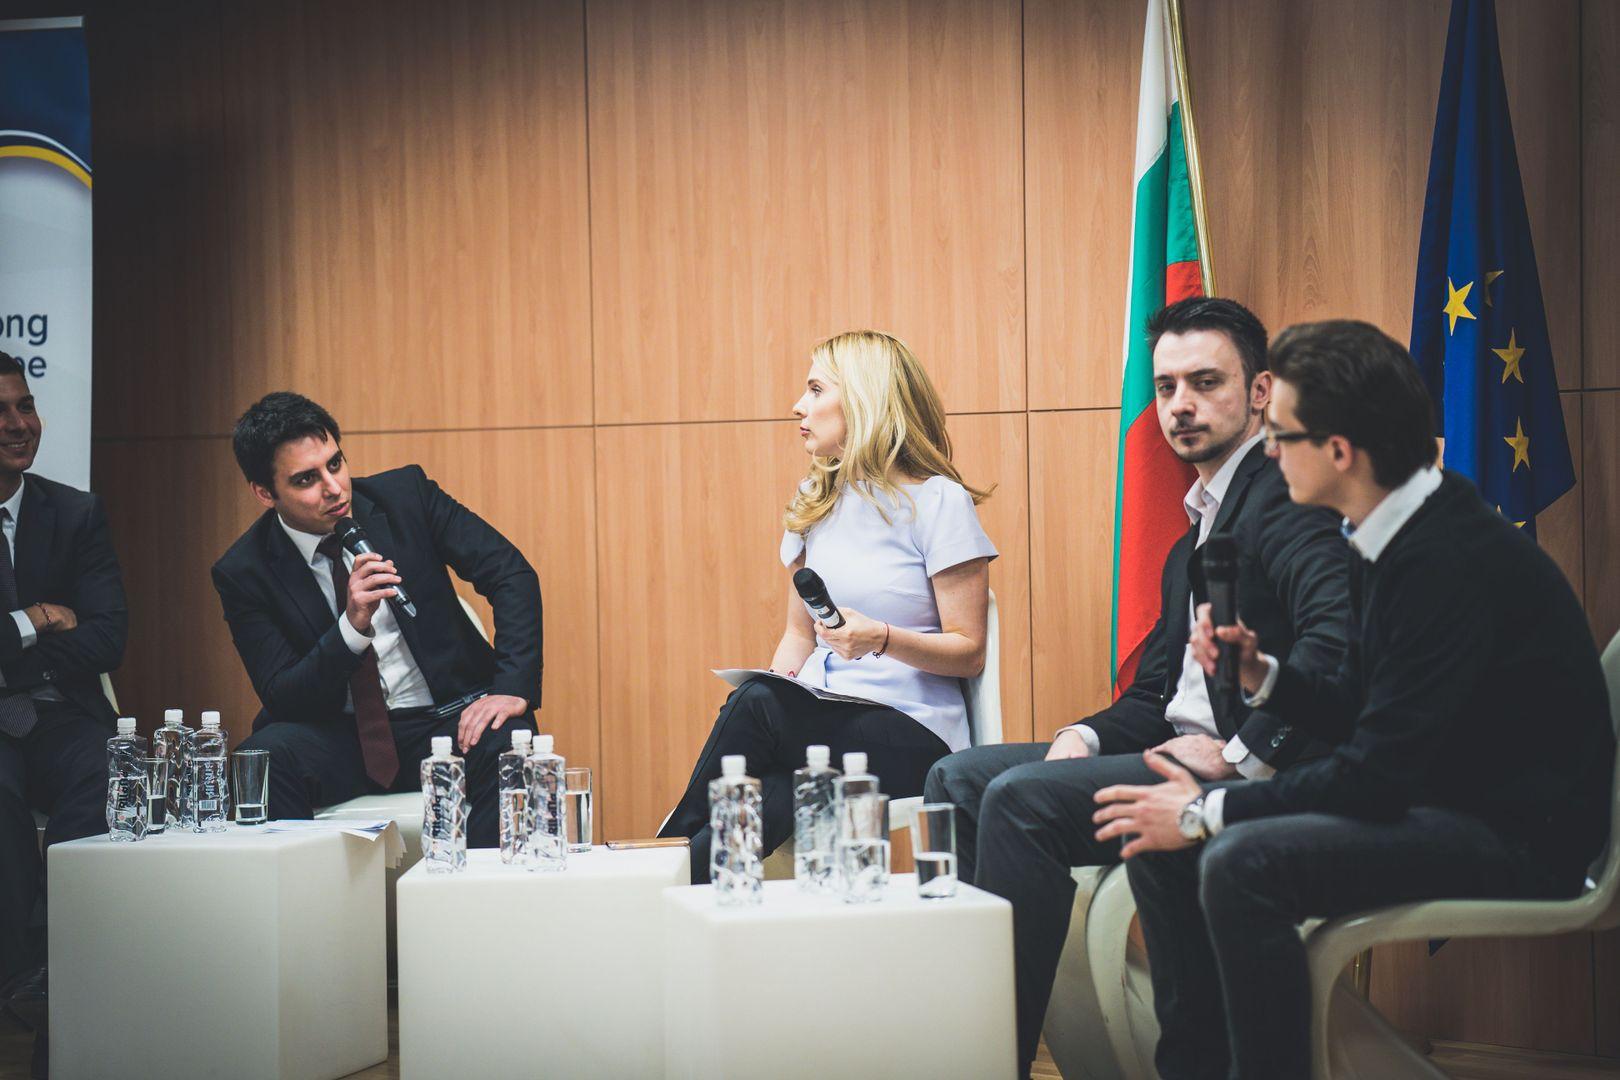 conservative-millenium-strongeurope-event-april-45